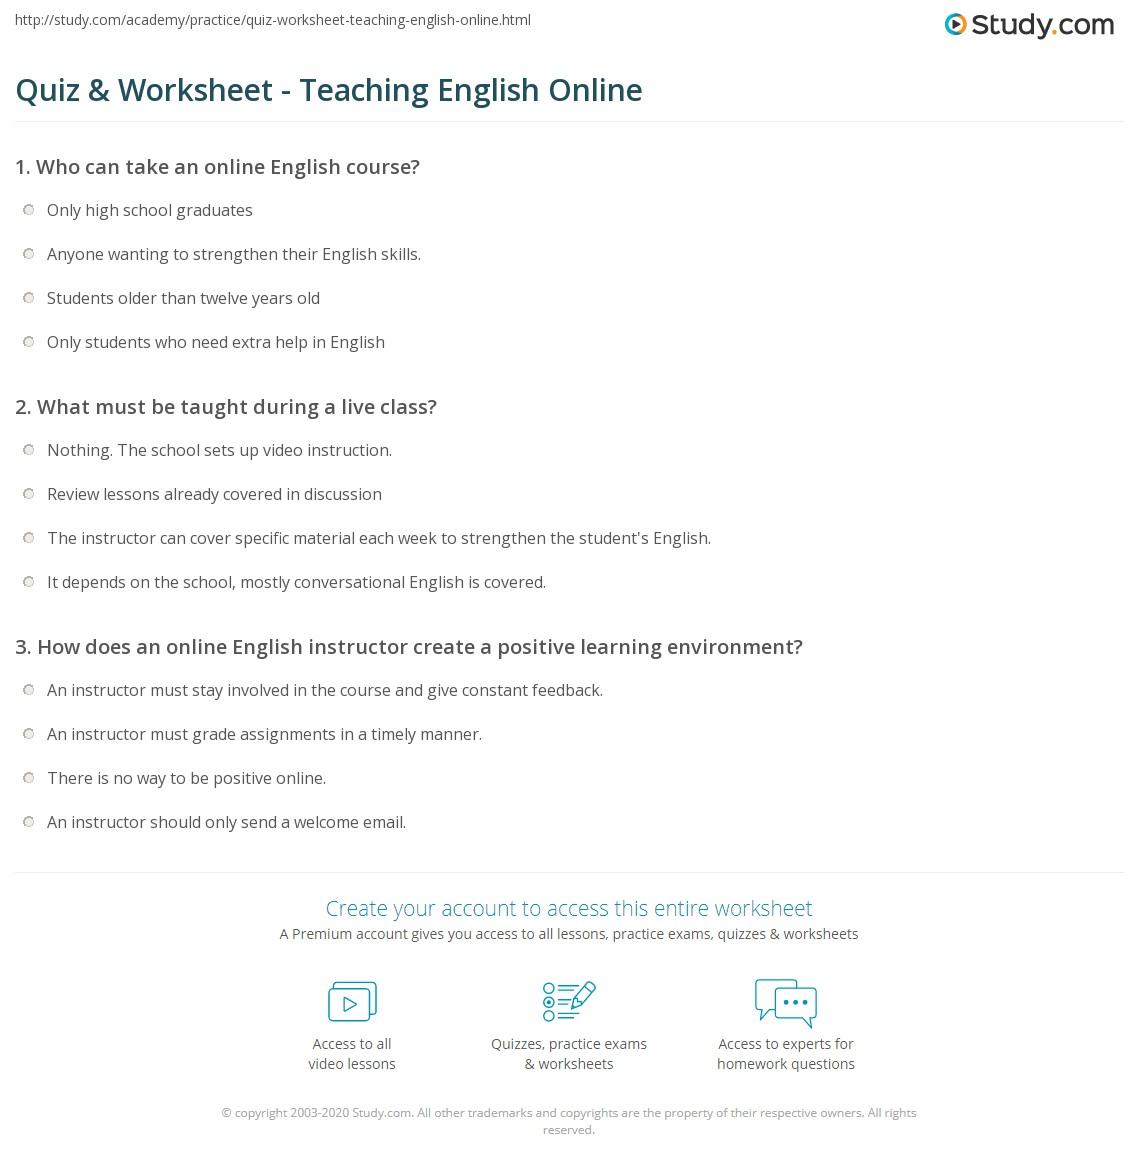 Quiz & Worksheet - Teaching English Online   Study.com